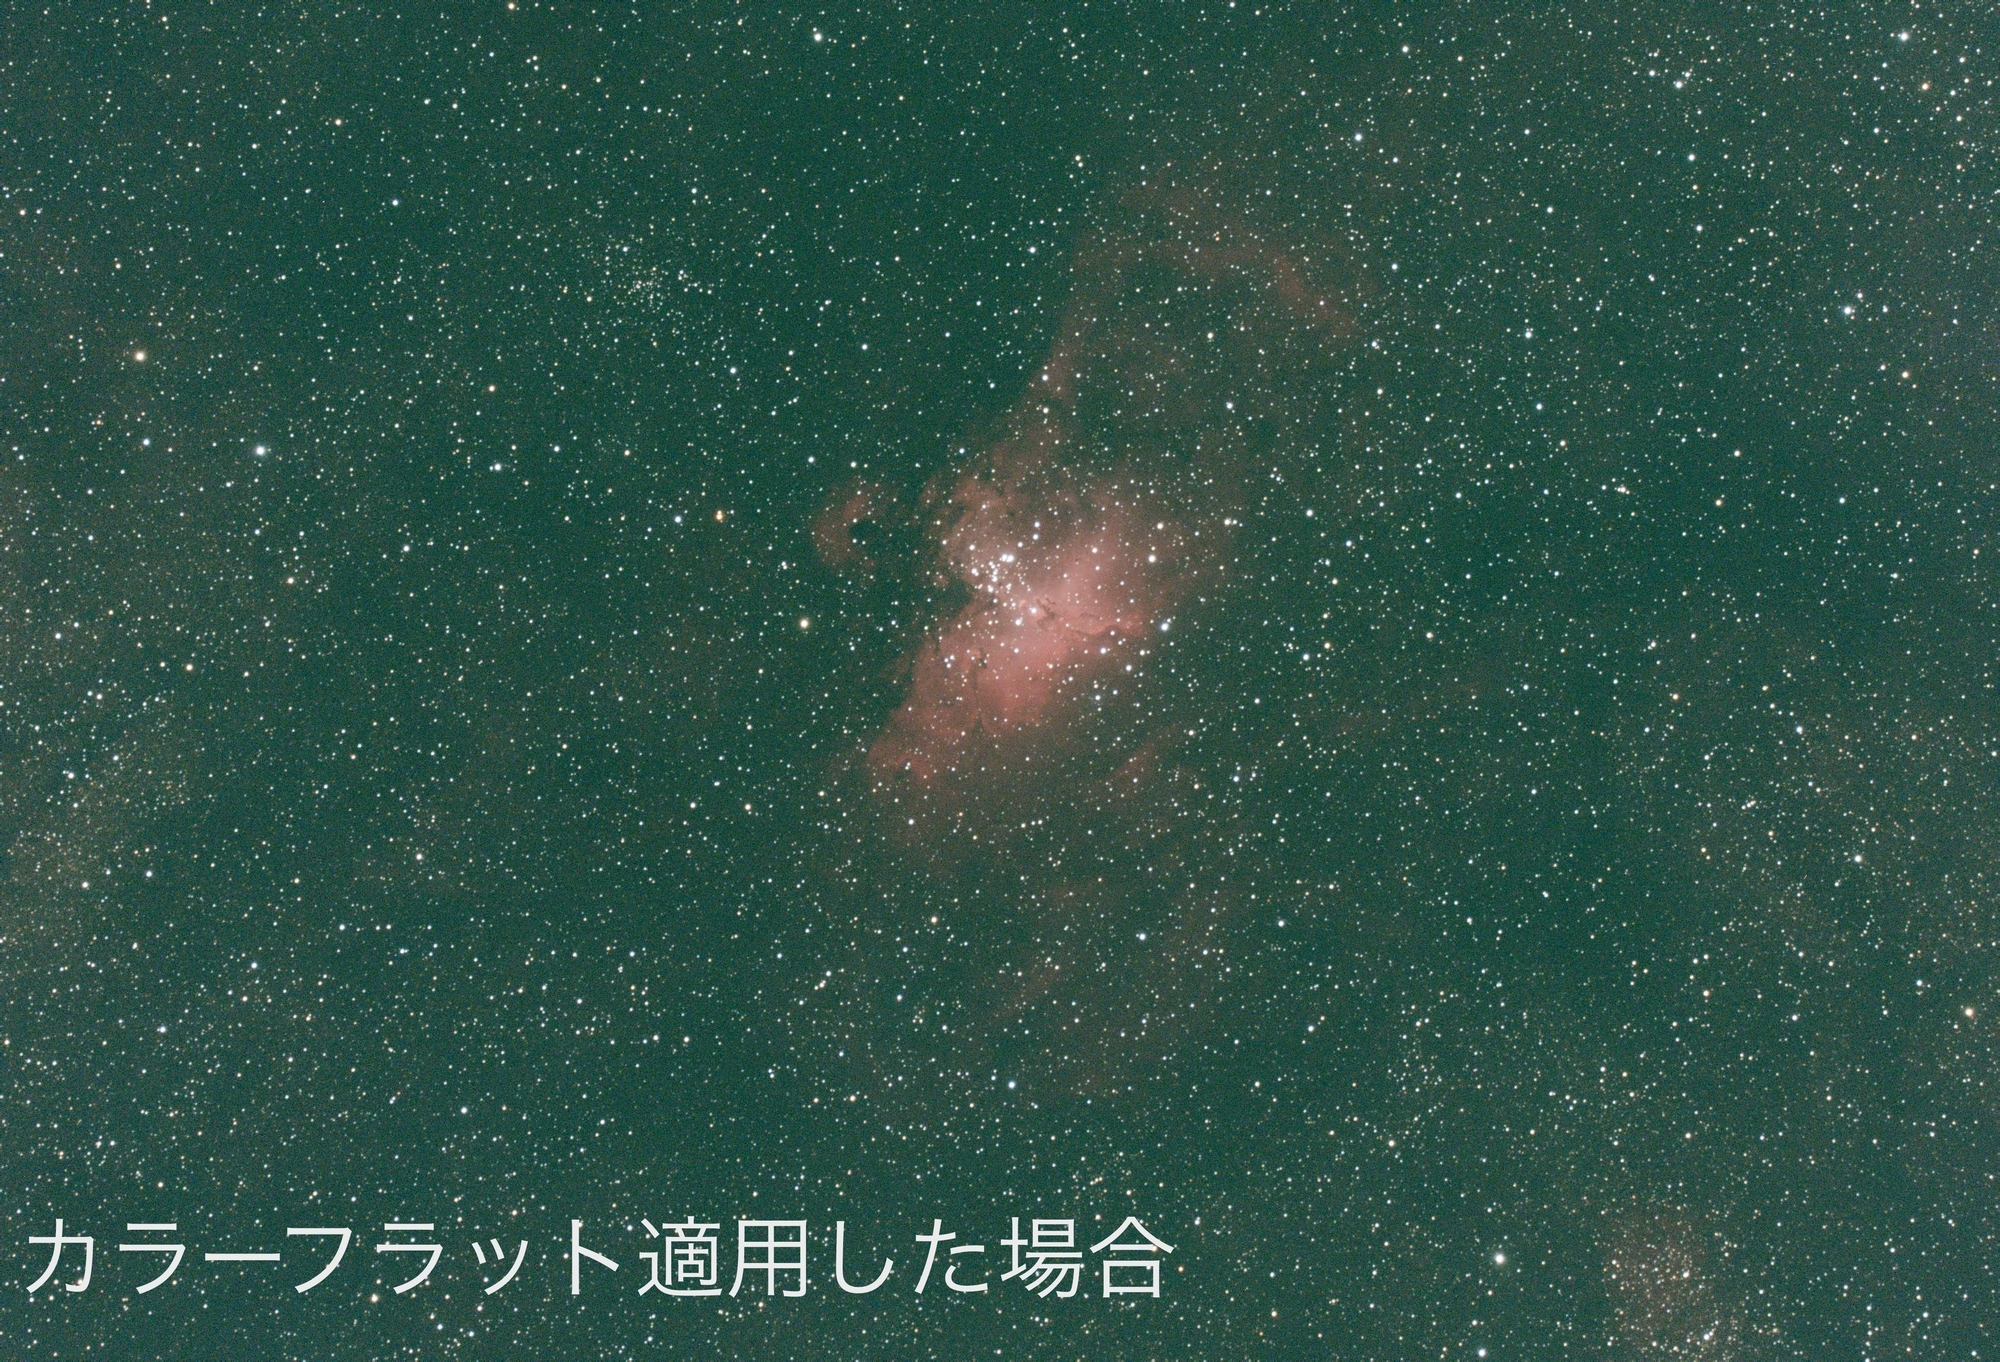 f:id:snct-astro:20200519232100j:plain